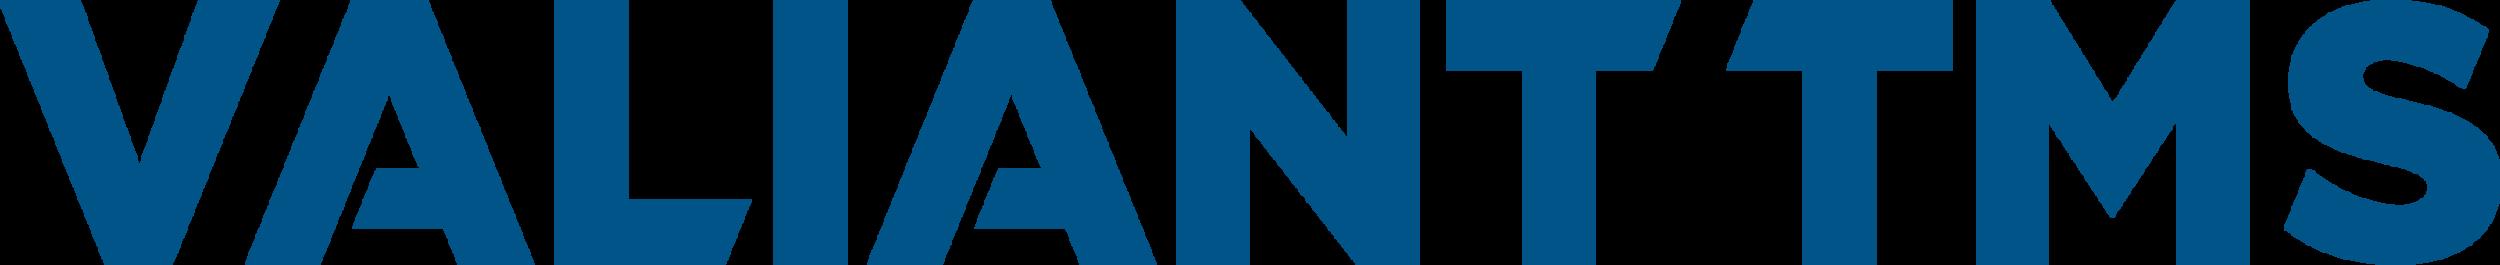 valianttms-logo-color.png